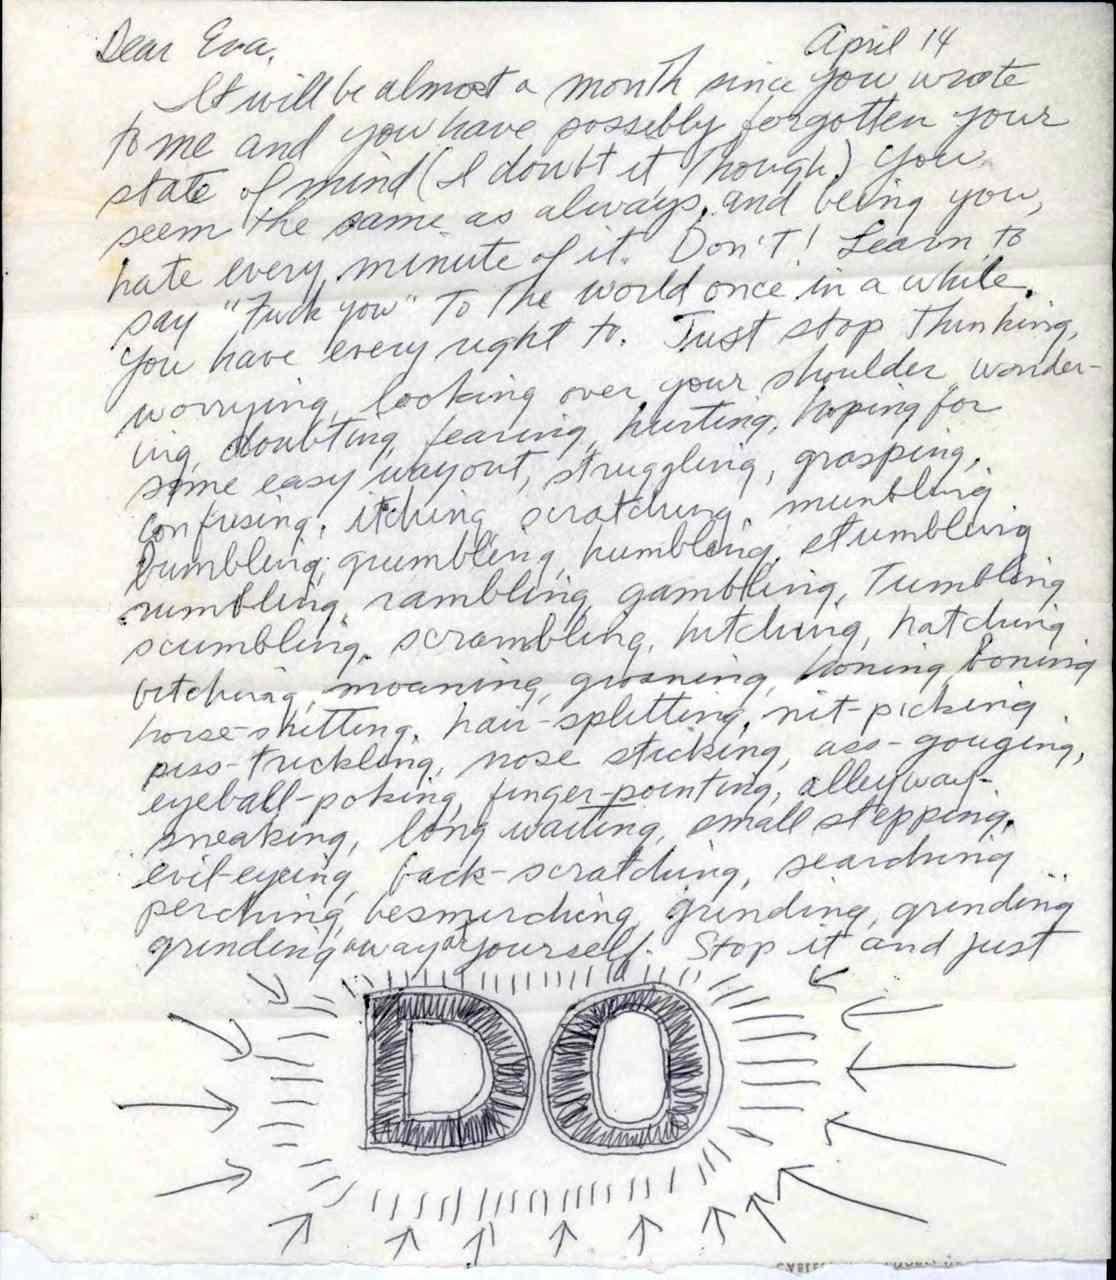 Sol LeWitt-Eva Hesse Letter-Page 1-FINAL